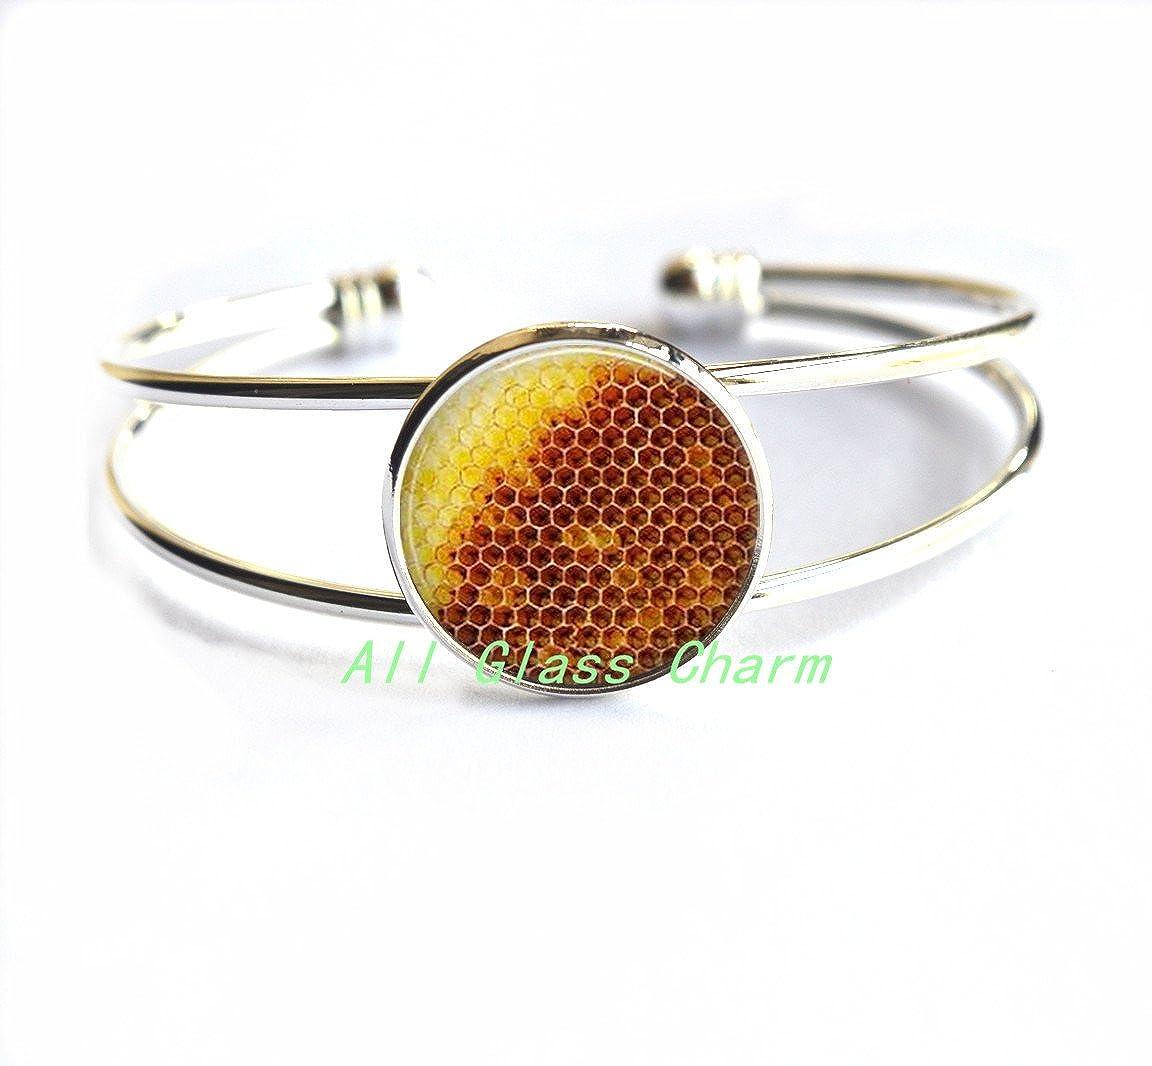 Save the Bees,AS056 Honeycomb Bracelets Honey Bracelet Naturist Charming Bracelet,Honeycomb Jewelry Honey Bee Beehive Honeycomb Bracelet Insect Jewelry